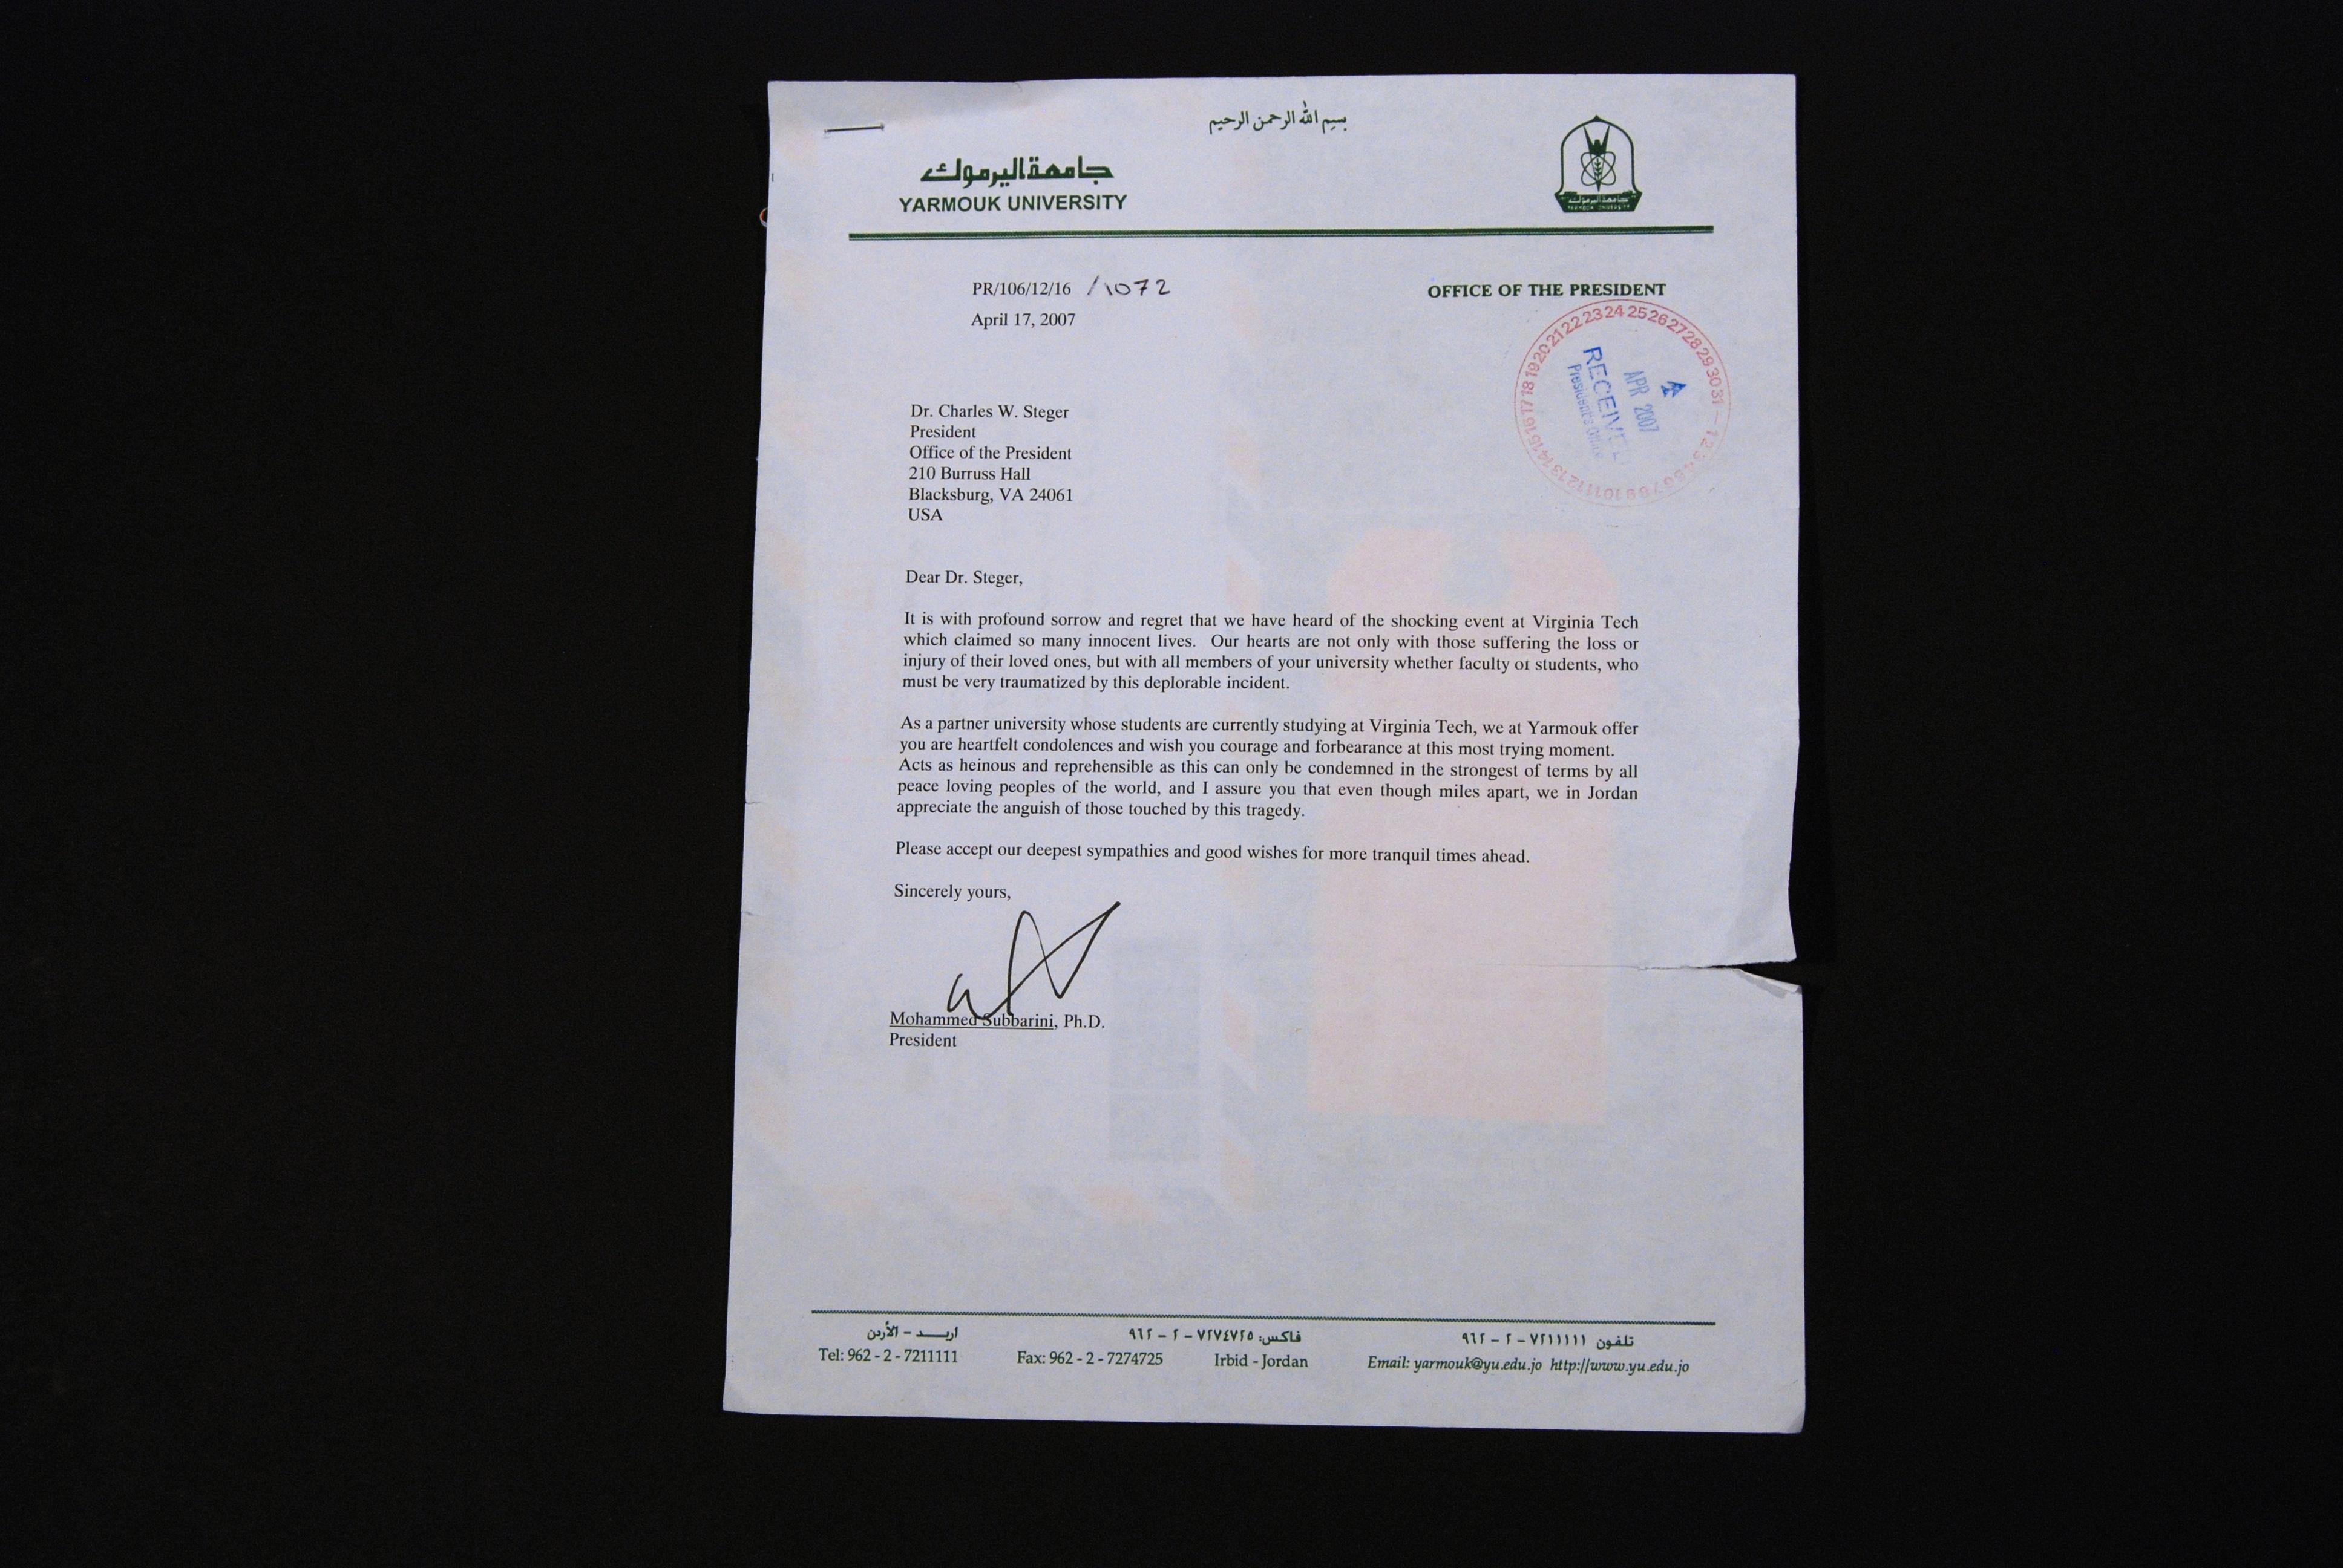 Letter from the President of Yarmouk University